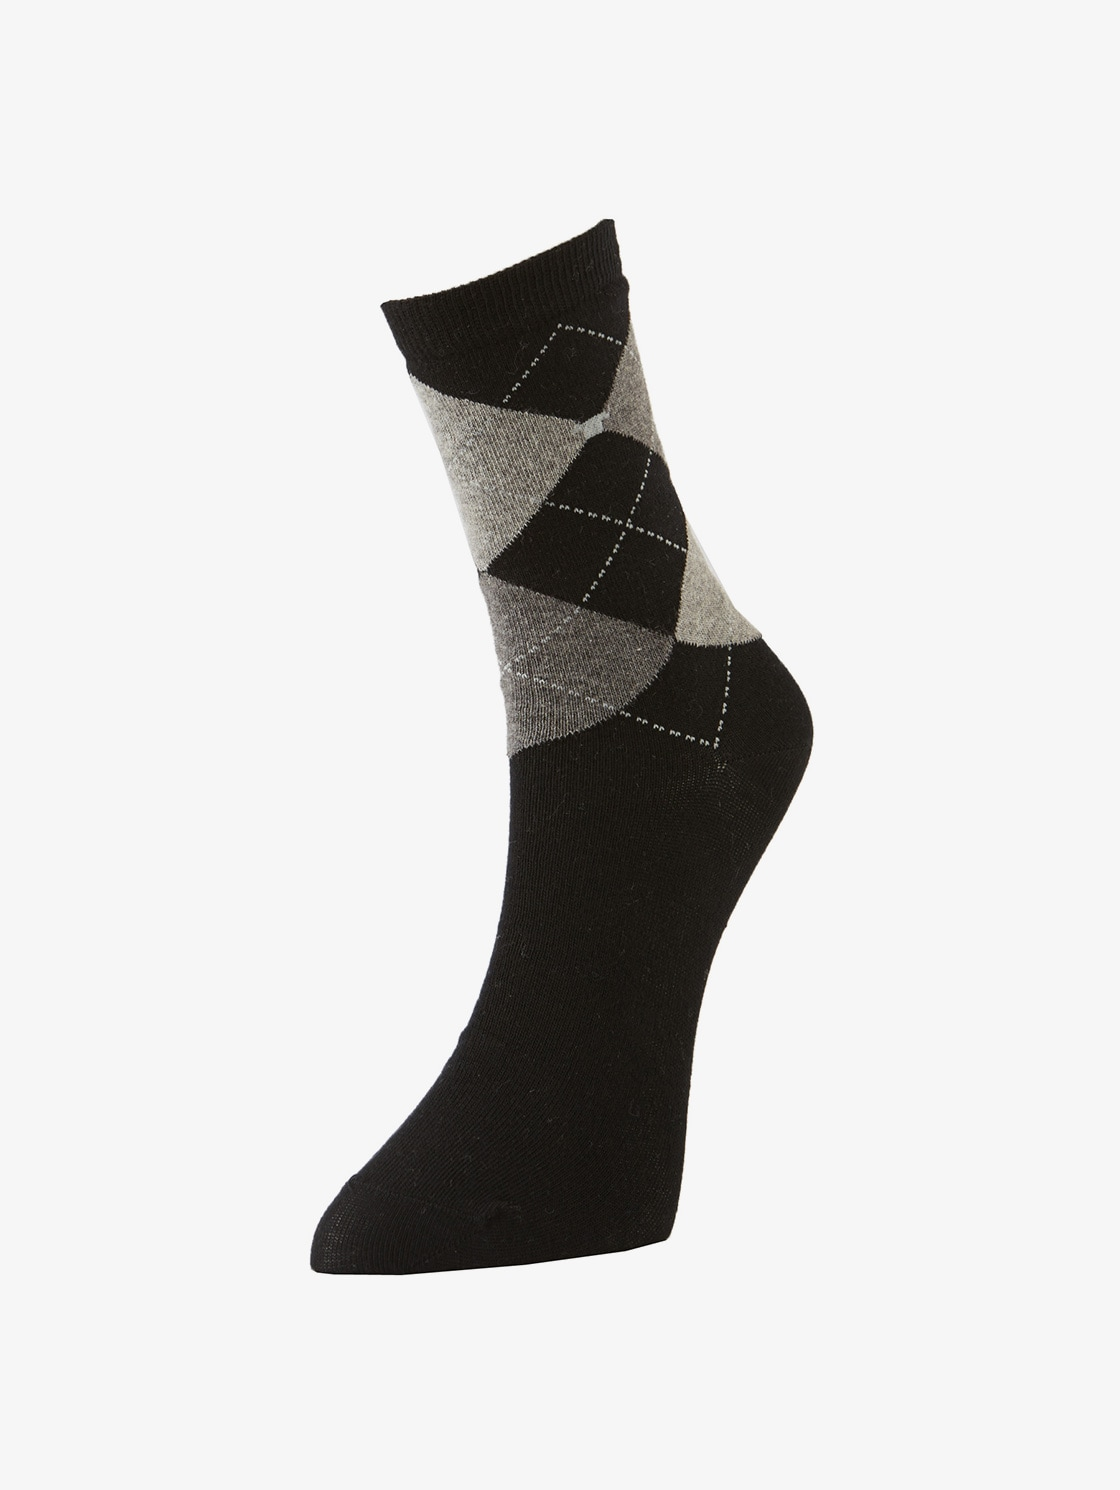 Tom Tailor Casual Socken im Doppelpack, Damen, black, Größe: 39 42